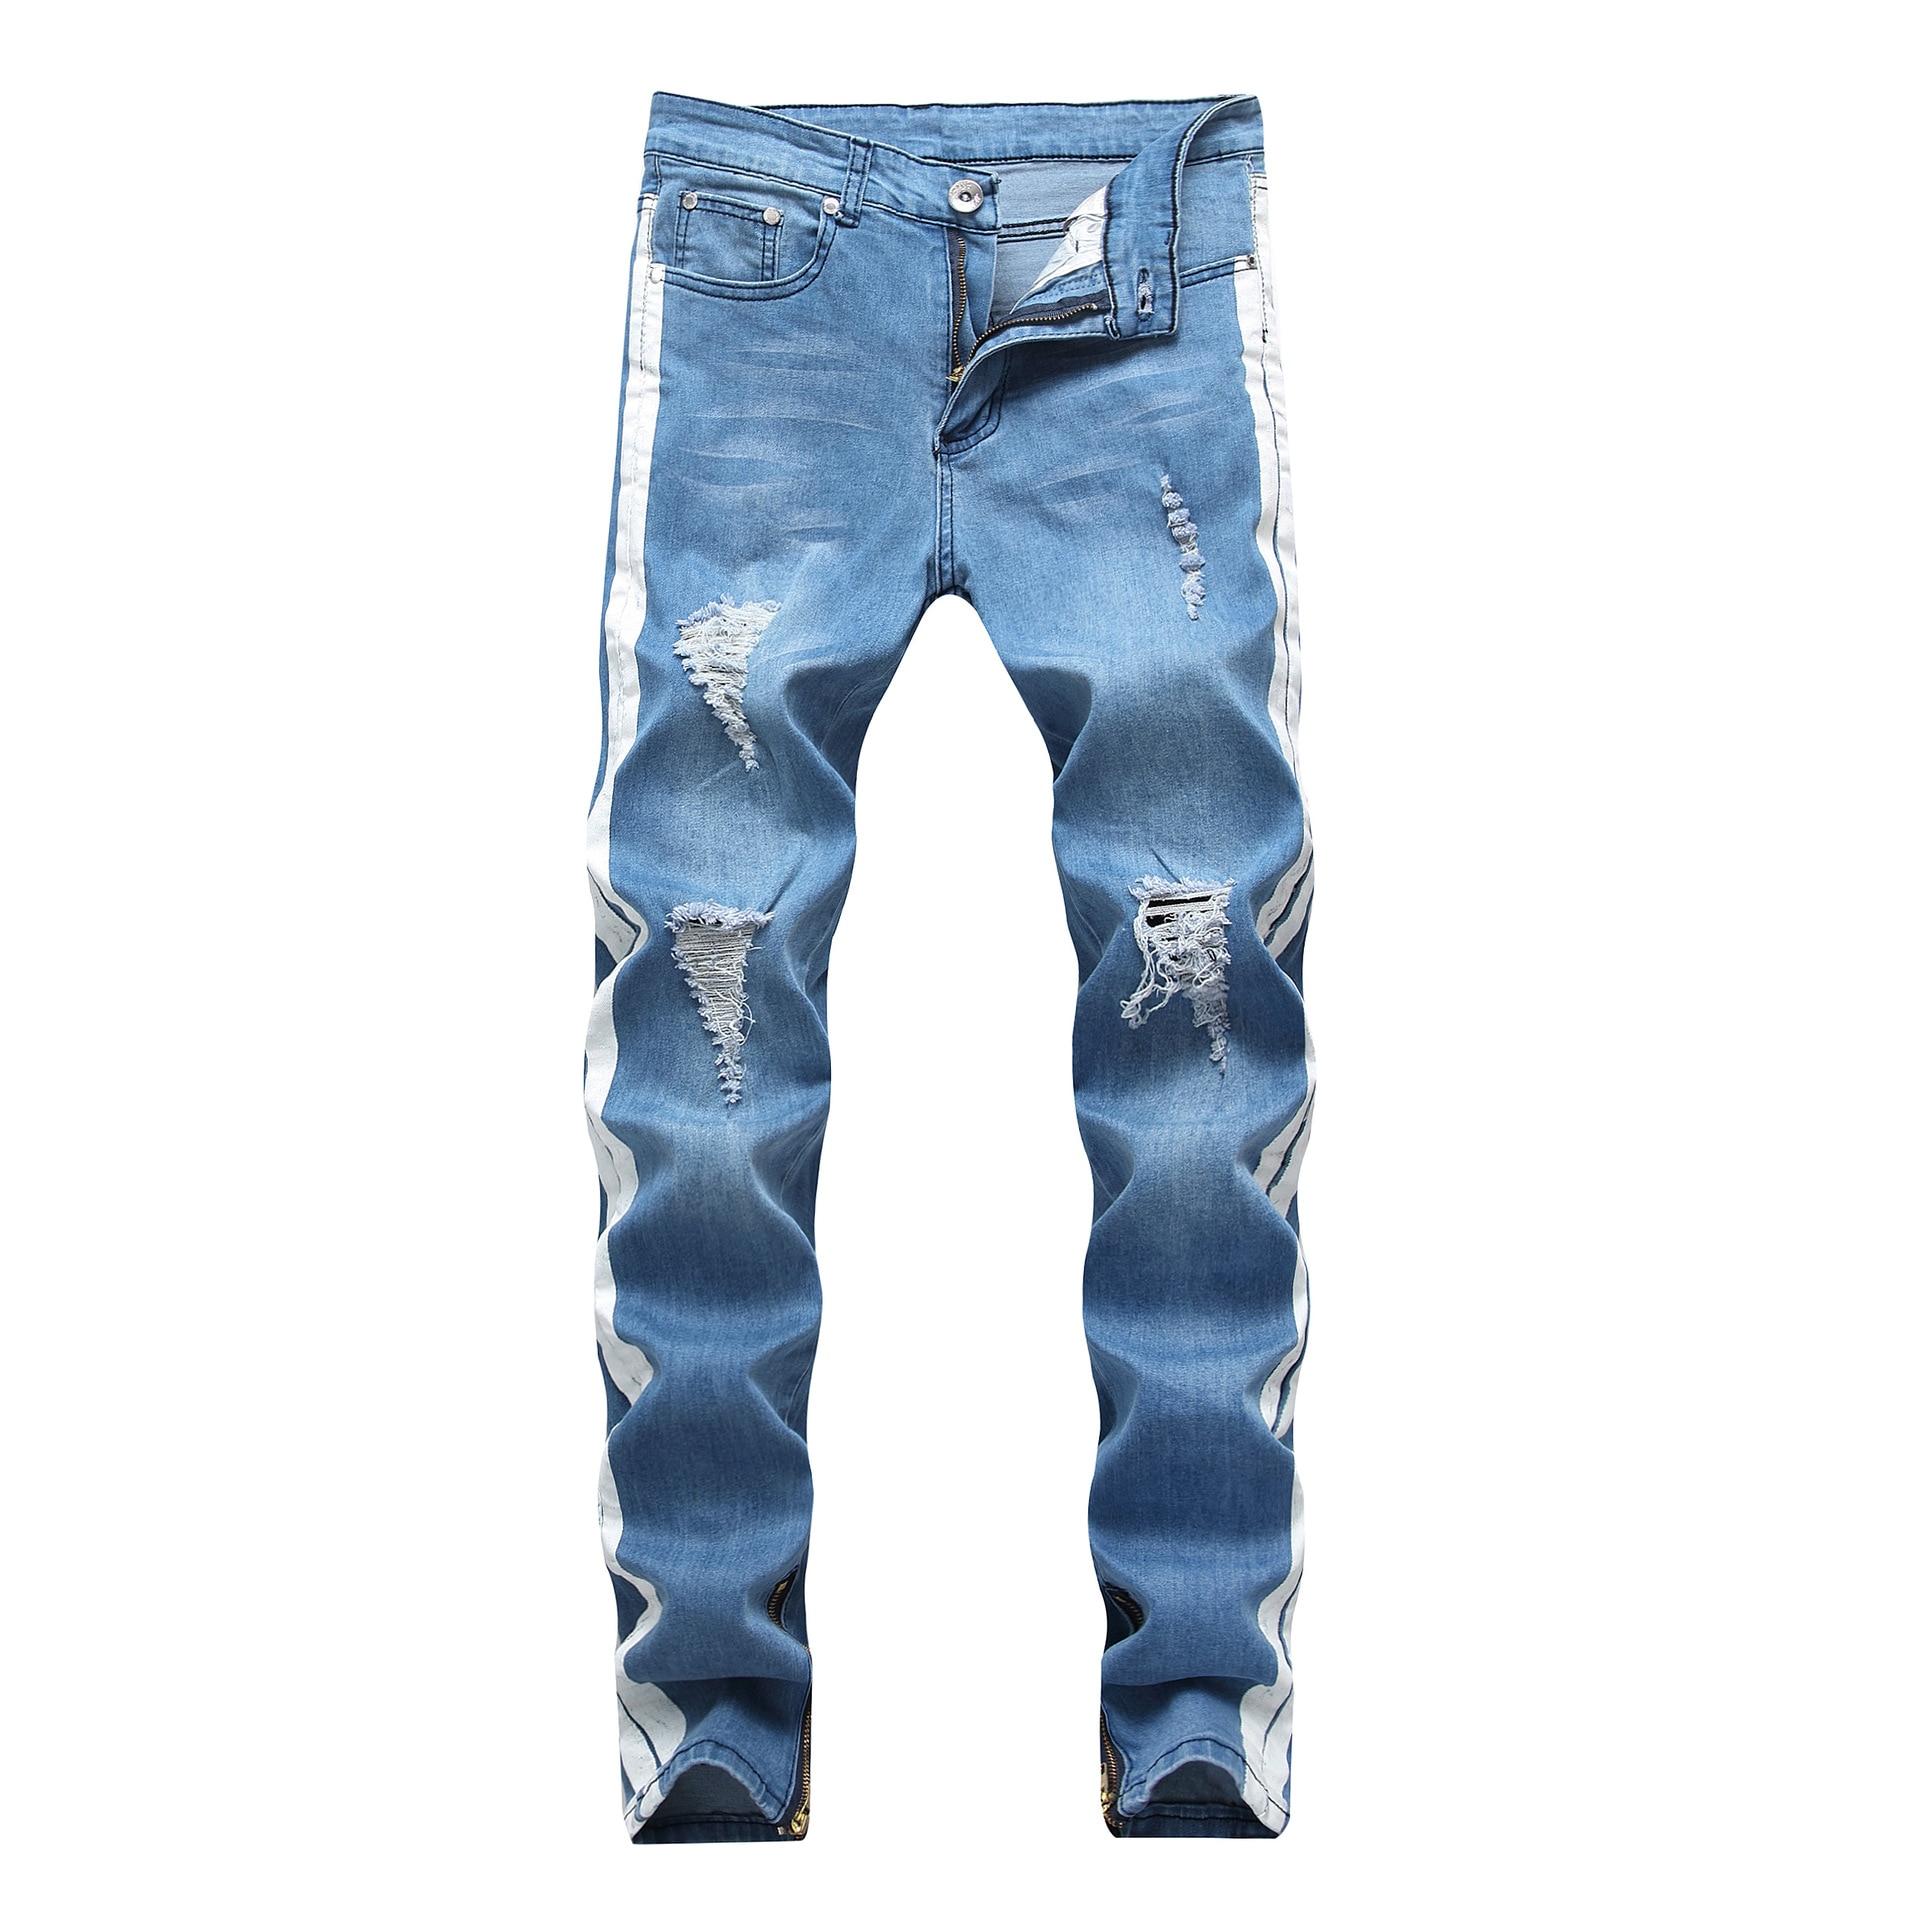 56336a024350 2018 New Fashion Men Holes Jeans European High Street Motorcycle Biker Jeans  Men Hip Hop Ripped Slim Jeans pants Dropshipping